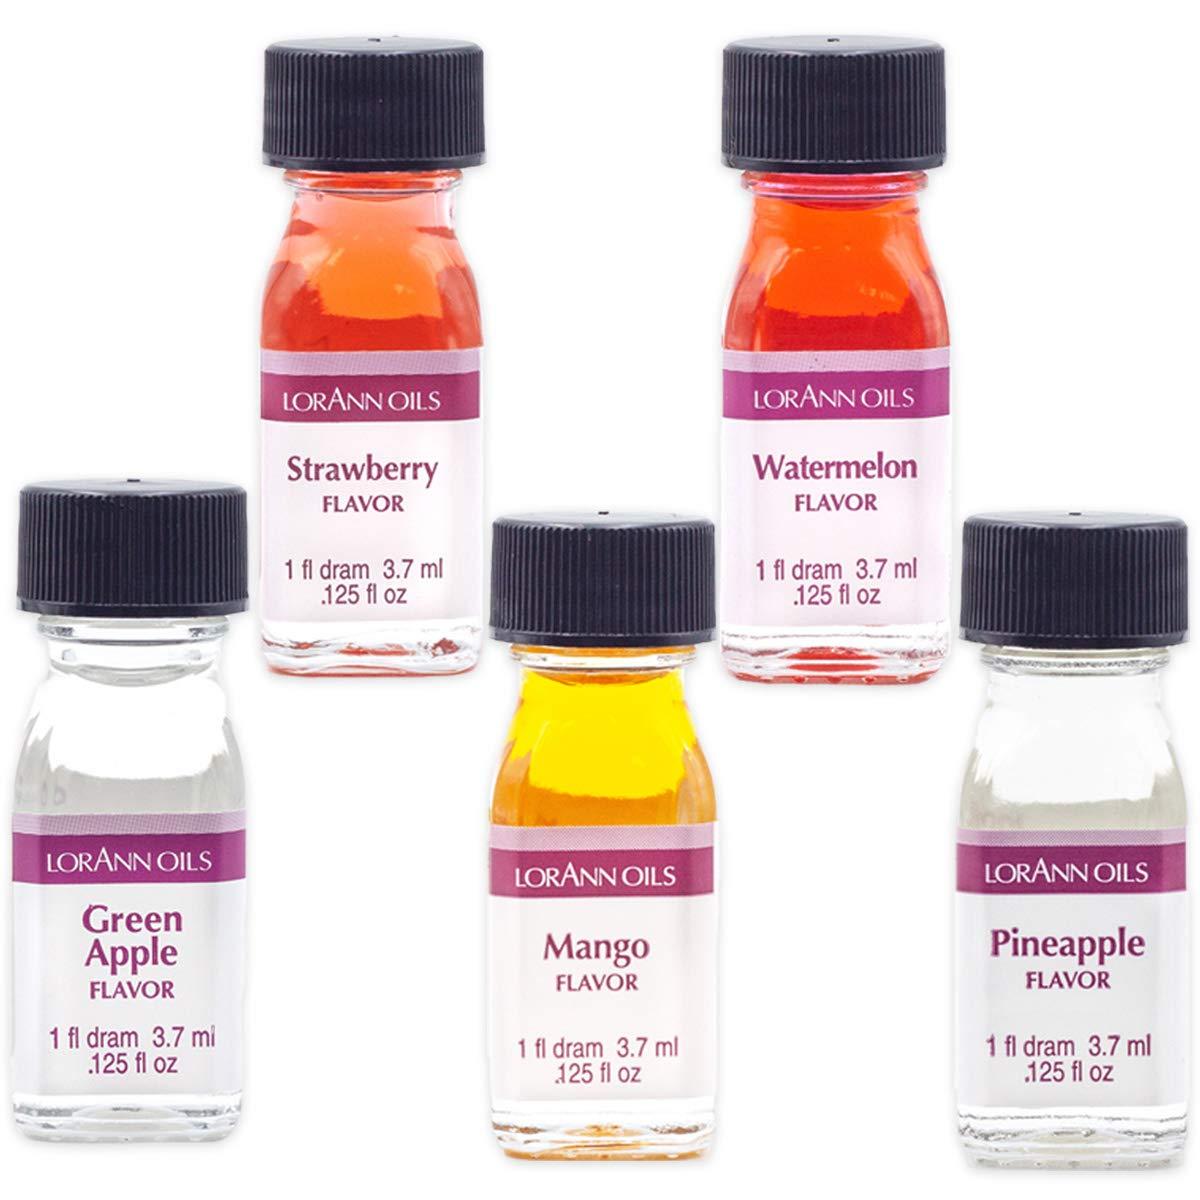 Lorann Super Strength flavors in 1 dram bottles (.0125 fl oz - 3.7ml) - 5 Pack - Includes Green Apple, Mango, Pineappl, Strawberry and Watermelon